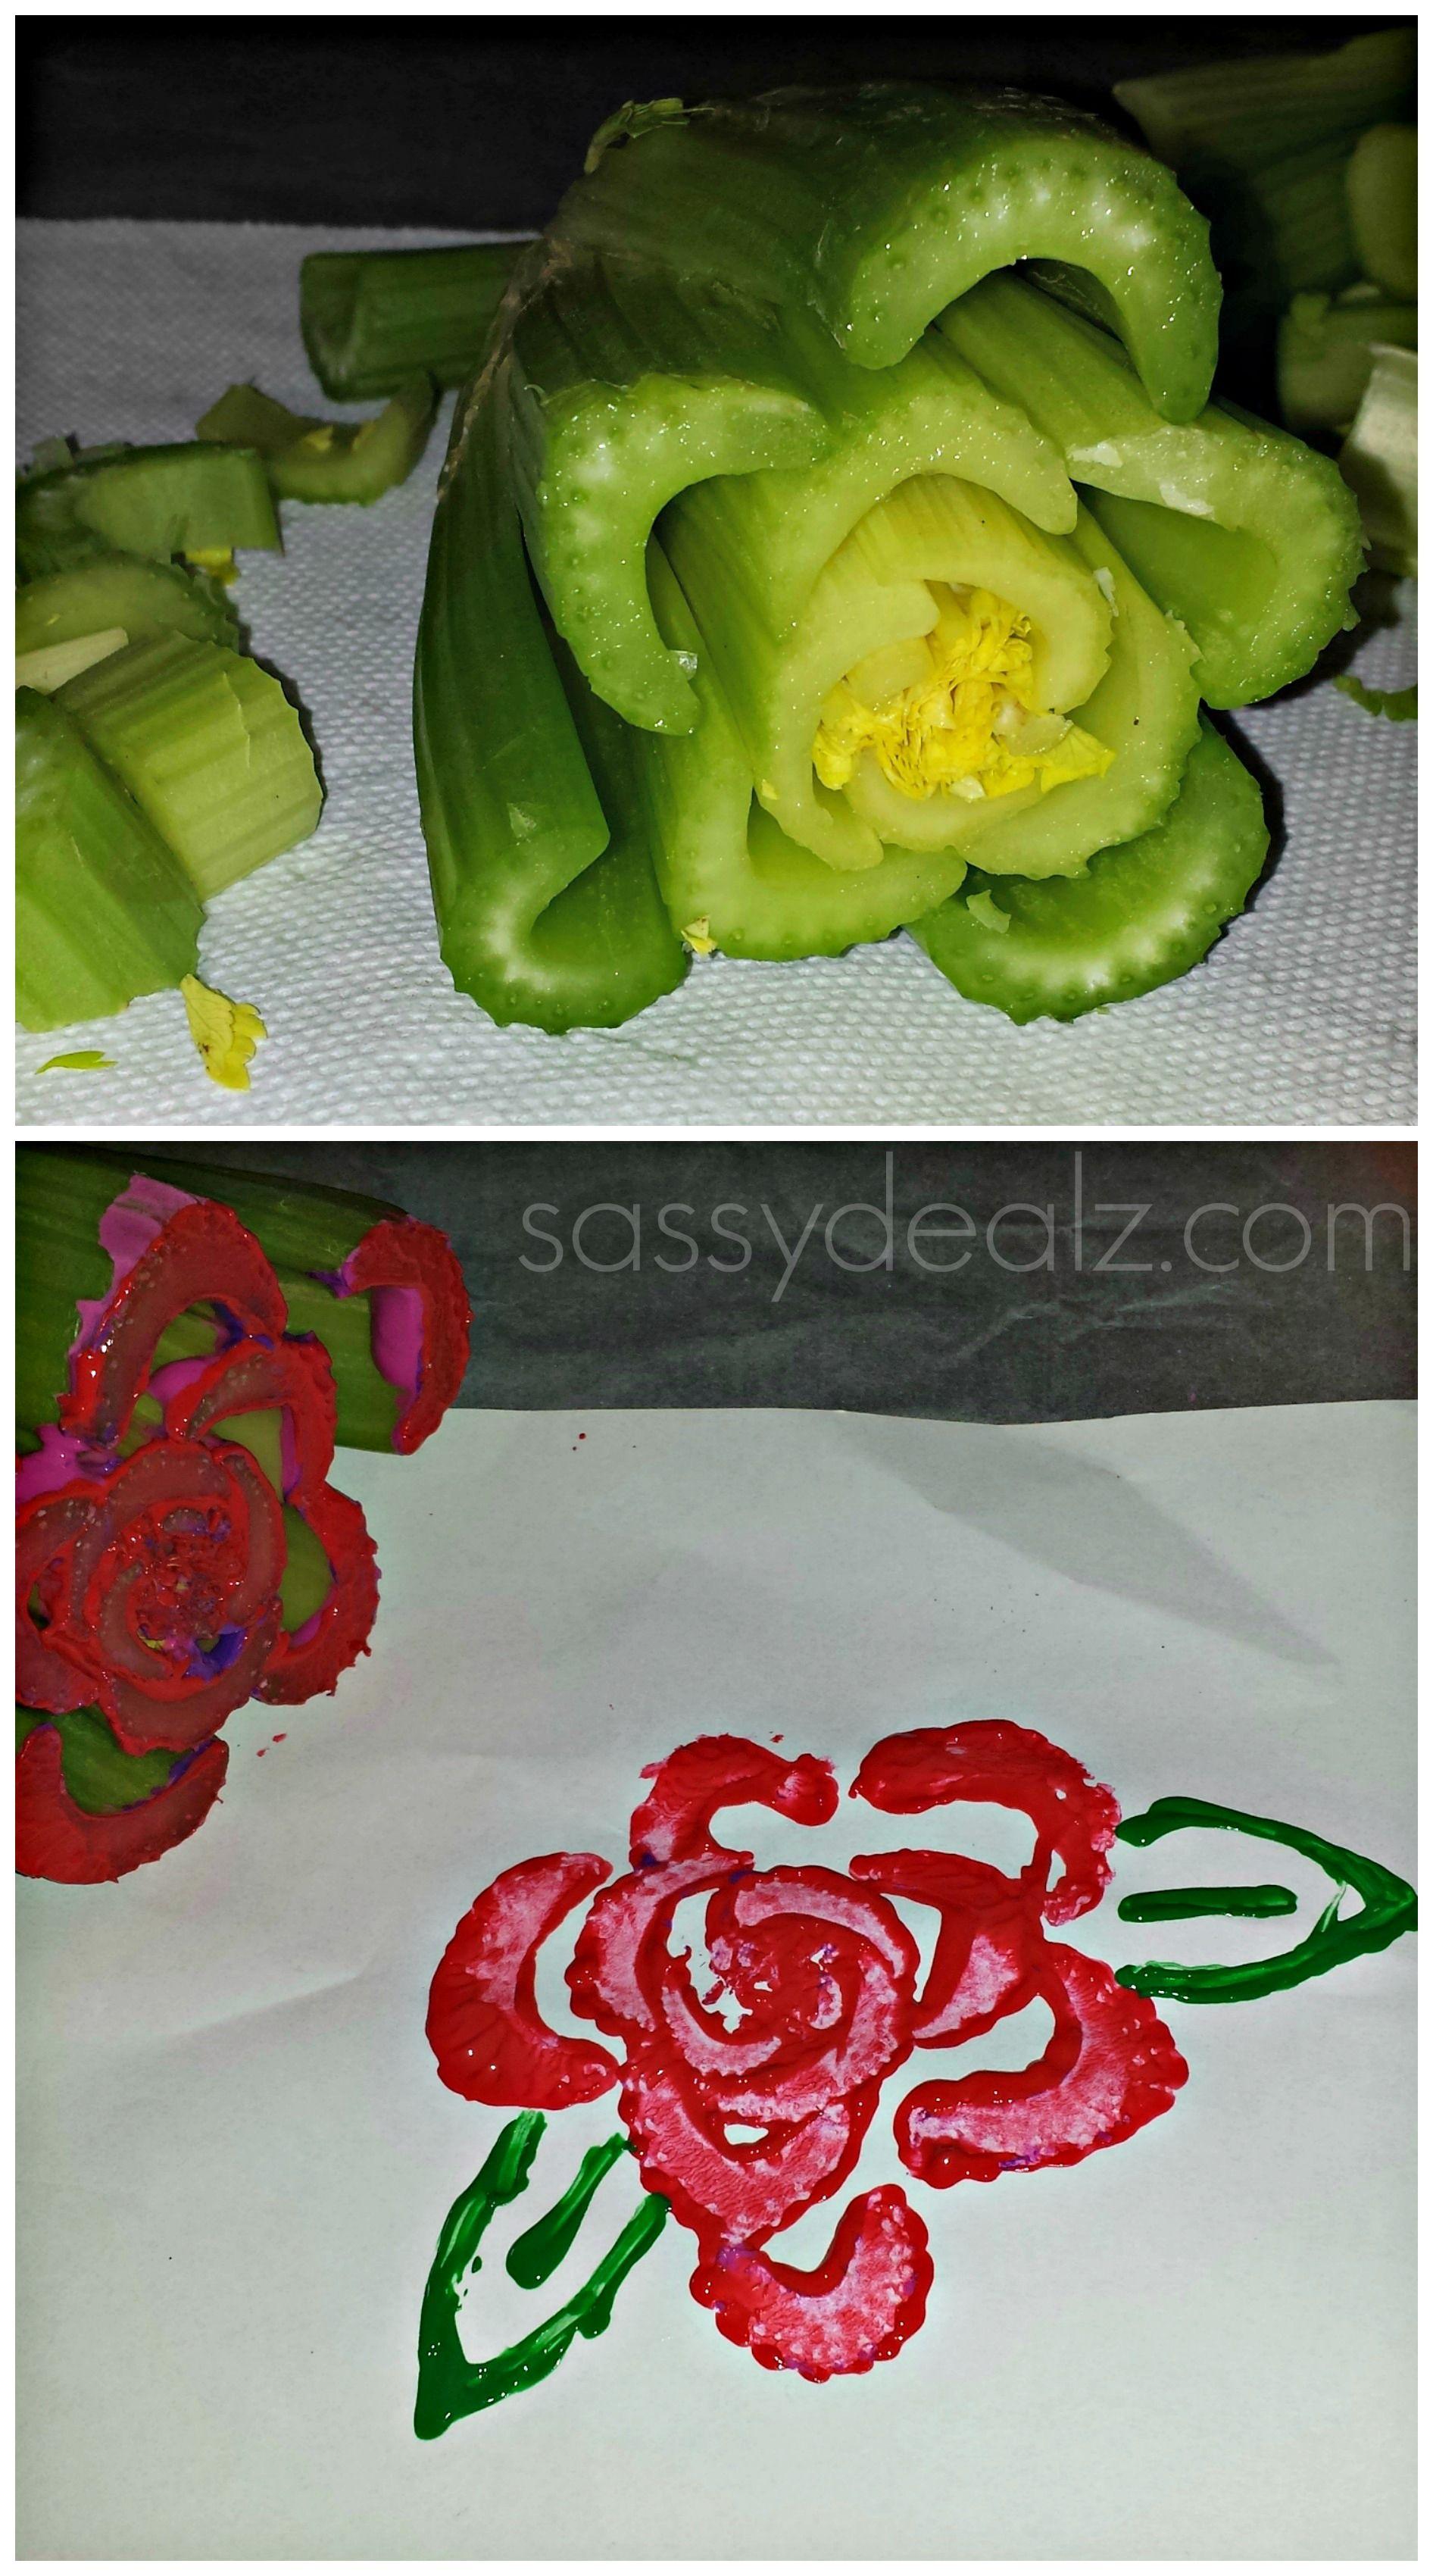 Celery Rose Flower Stamping Craft For Kids Celery Art Project Valentines Card Idea